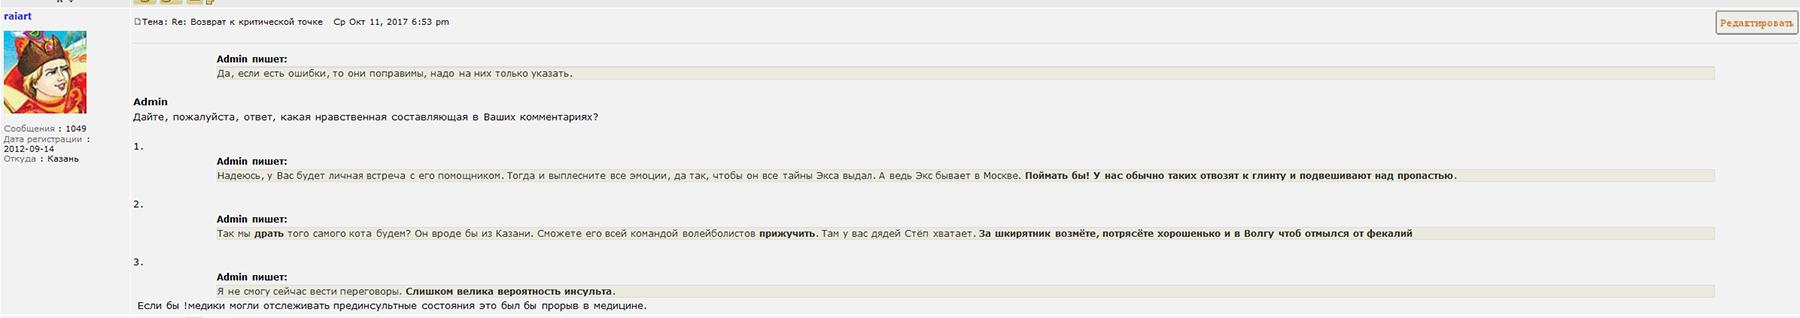 Лариса Губарькова, Николай Панков, Представитель Народа и др. 4114